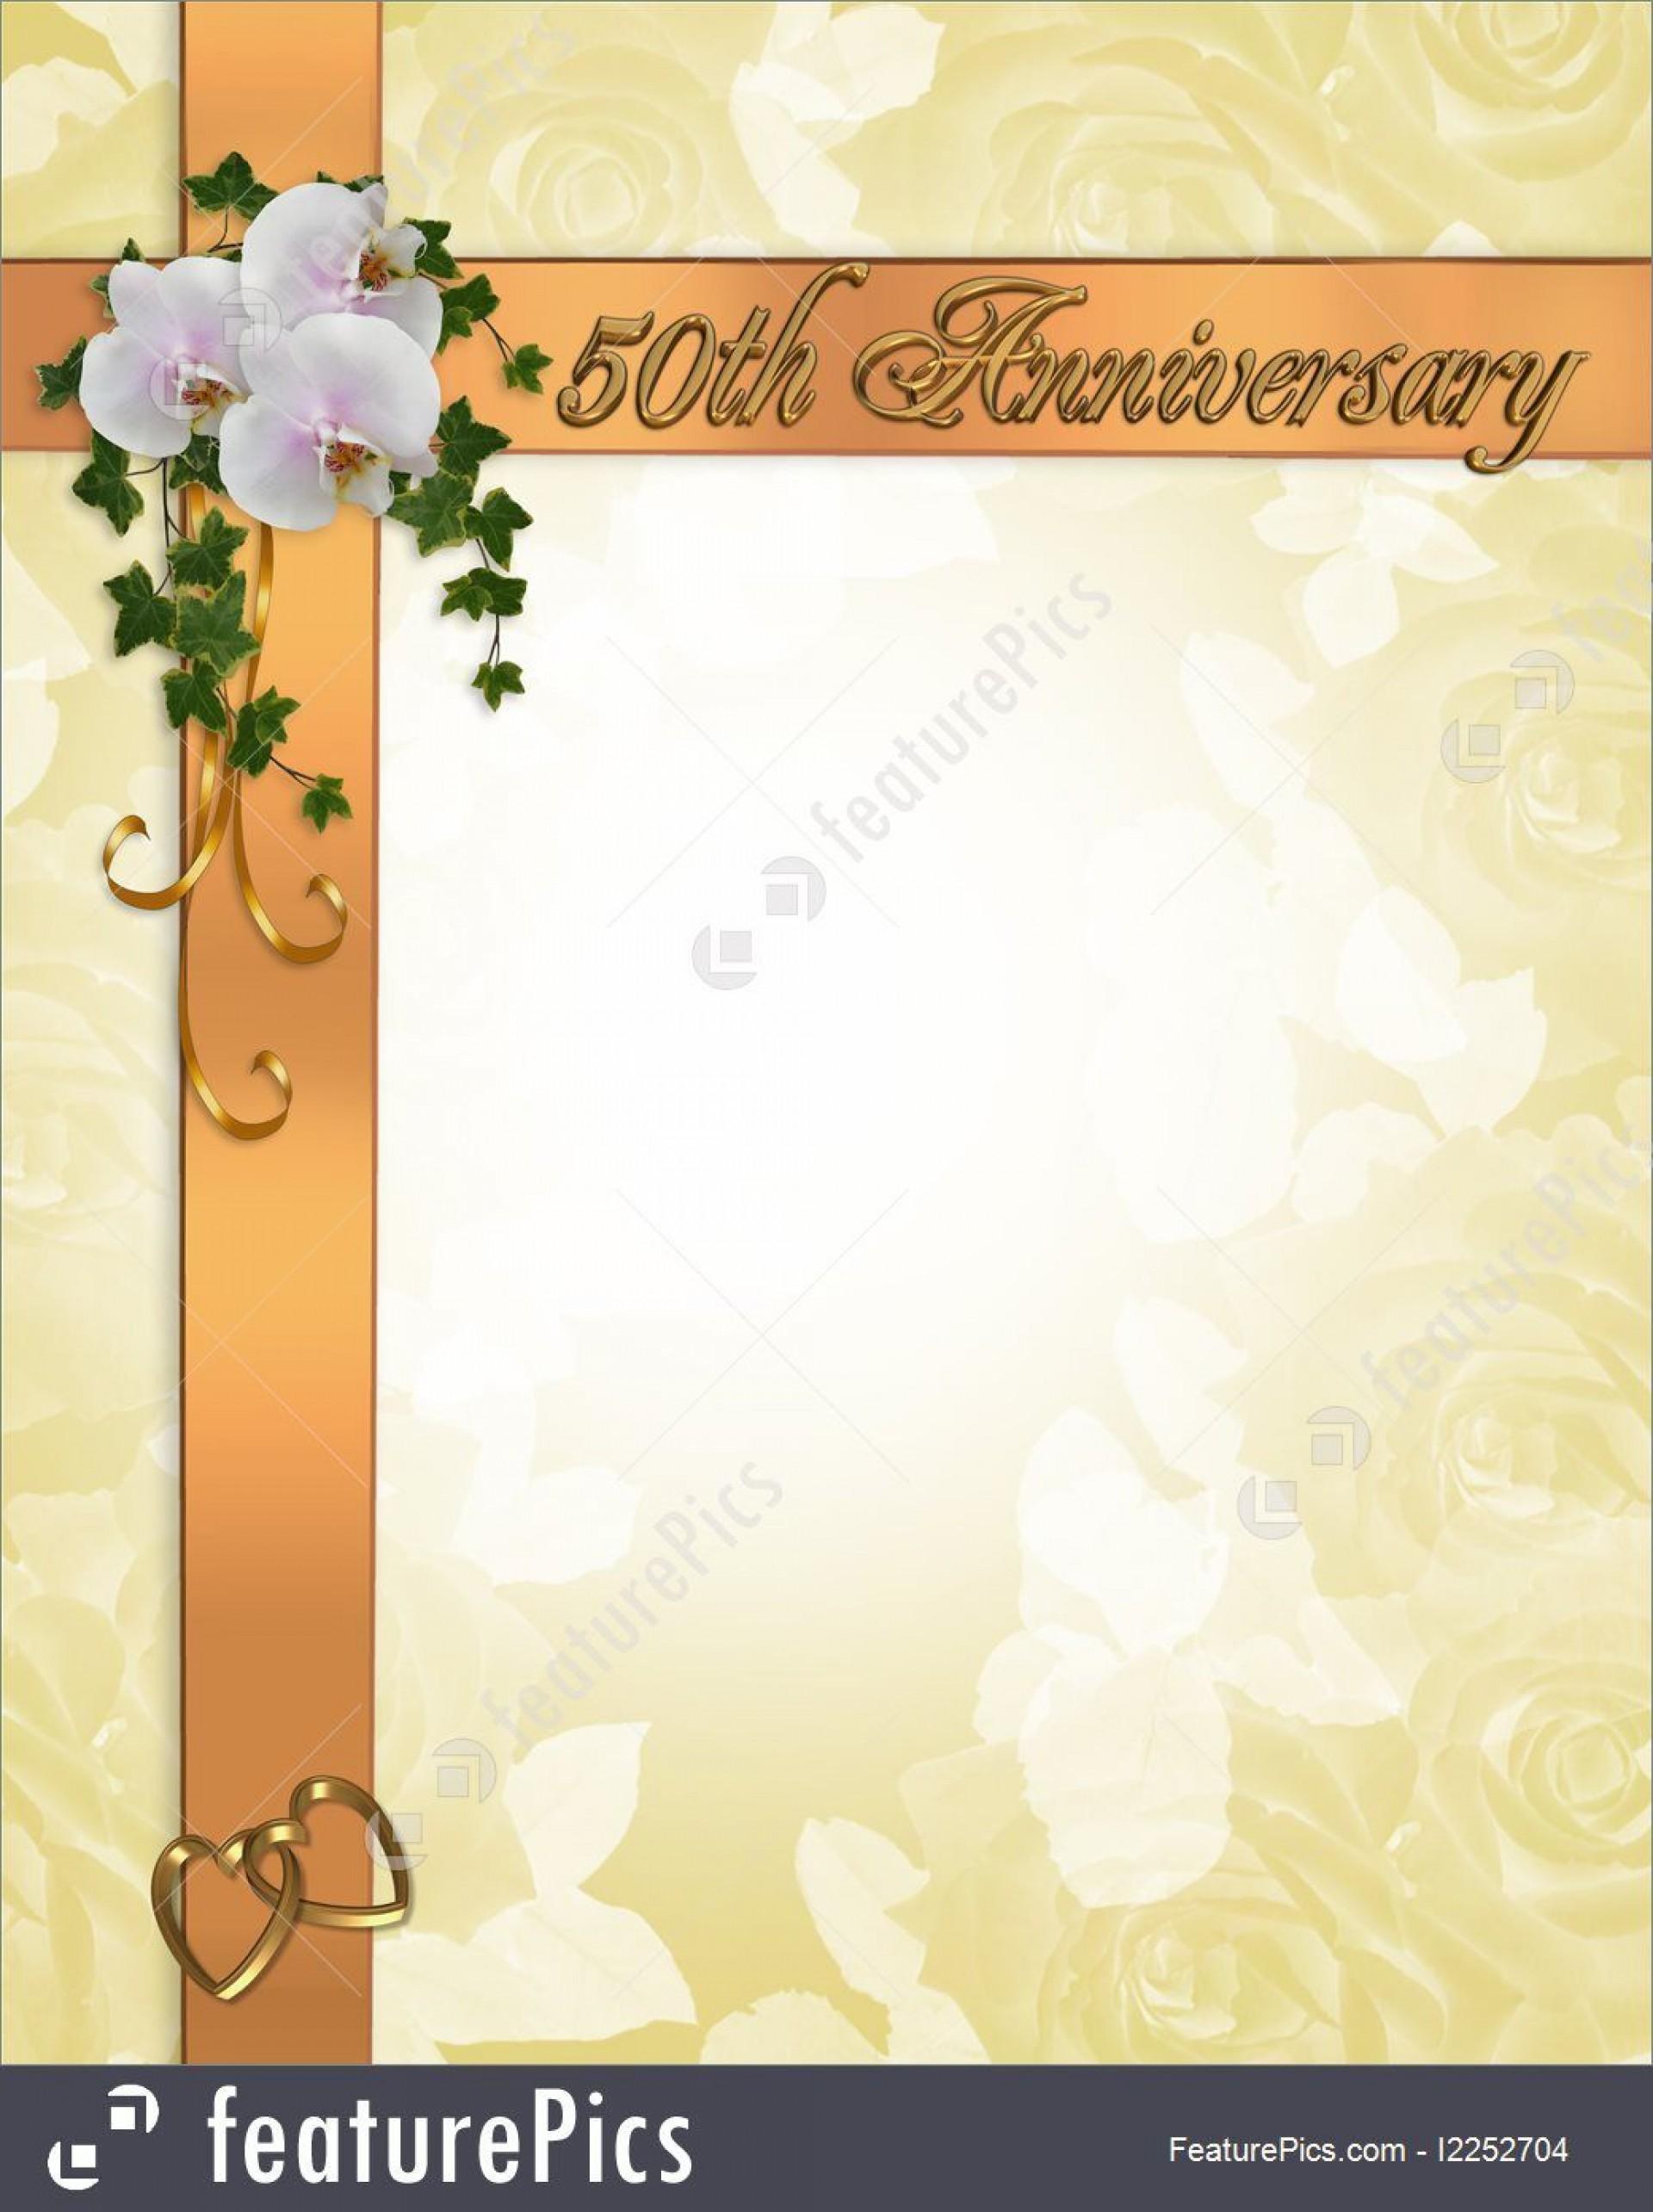 000 Stirring 50th Anniversary Invitation Card Template Design  Templates Free1920